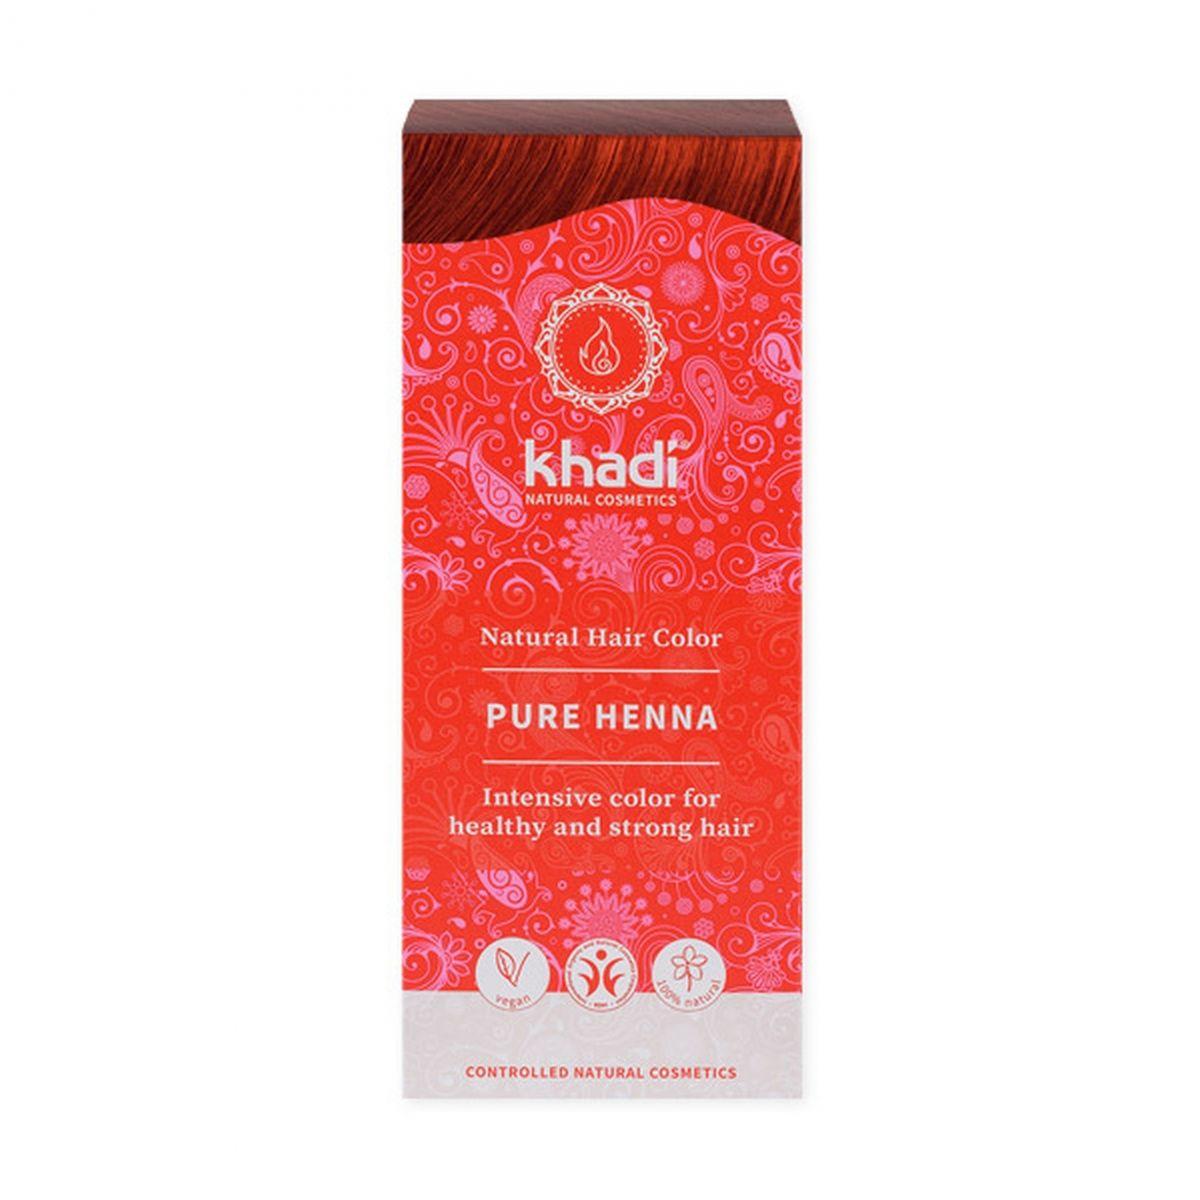 Naturalna indyjska henna - naturalna czerwona (ruda) - 100g - Khadi